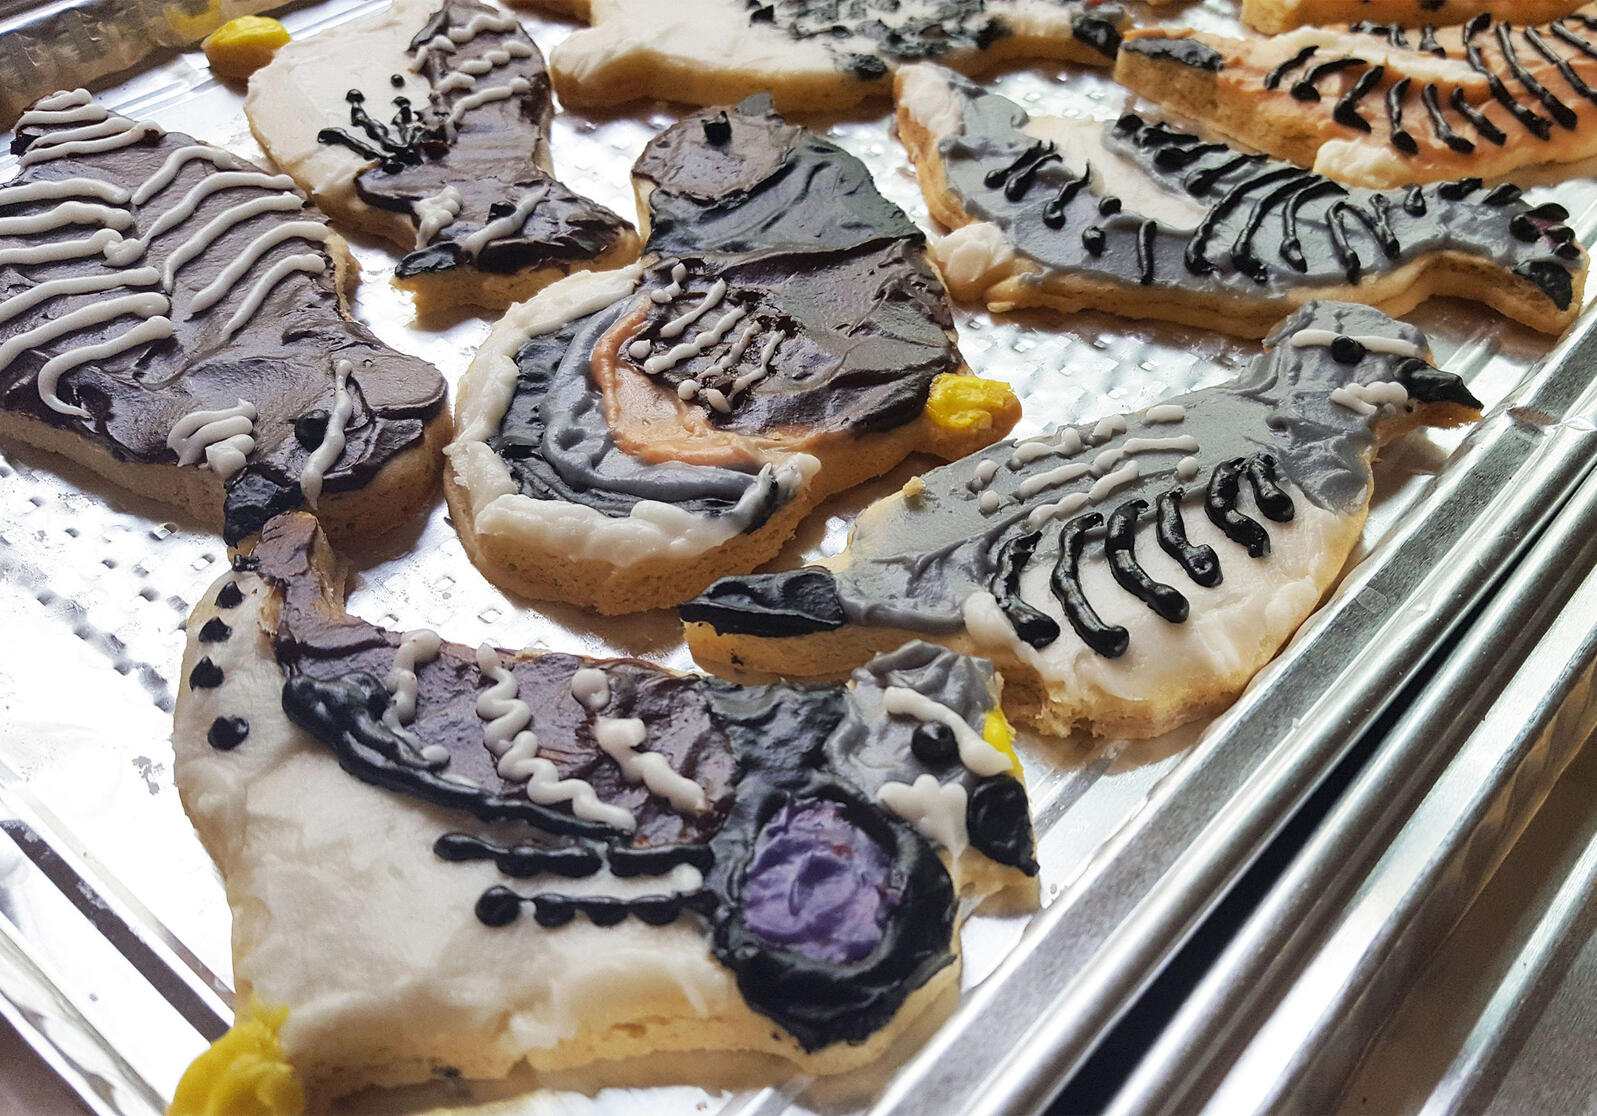 Sarah MacLean sees her custom cookies as a way to get people excited about birds. Sarah MacLean